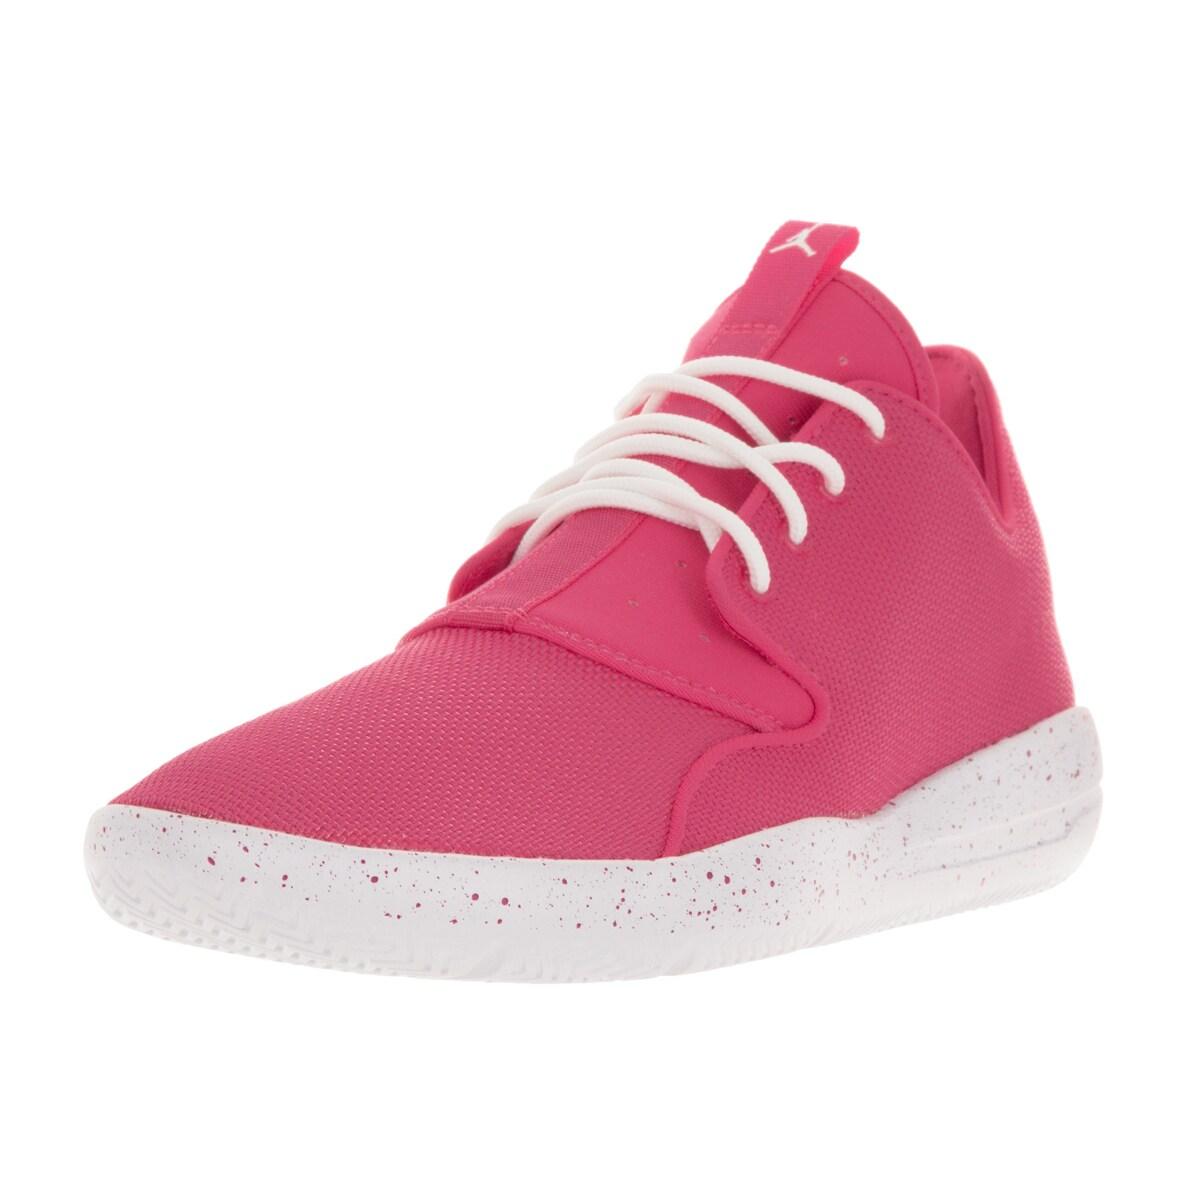 Nike Jordan Kids Jordan Eclipse GG Vivid Pink/White/White...